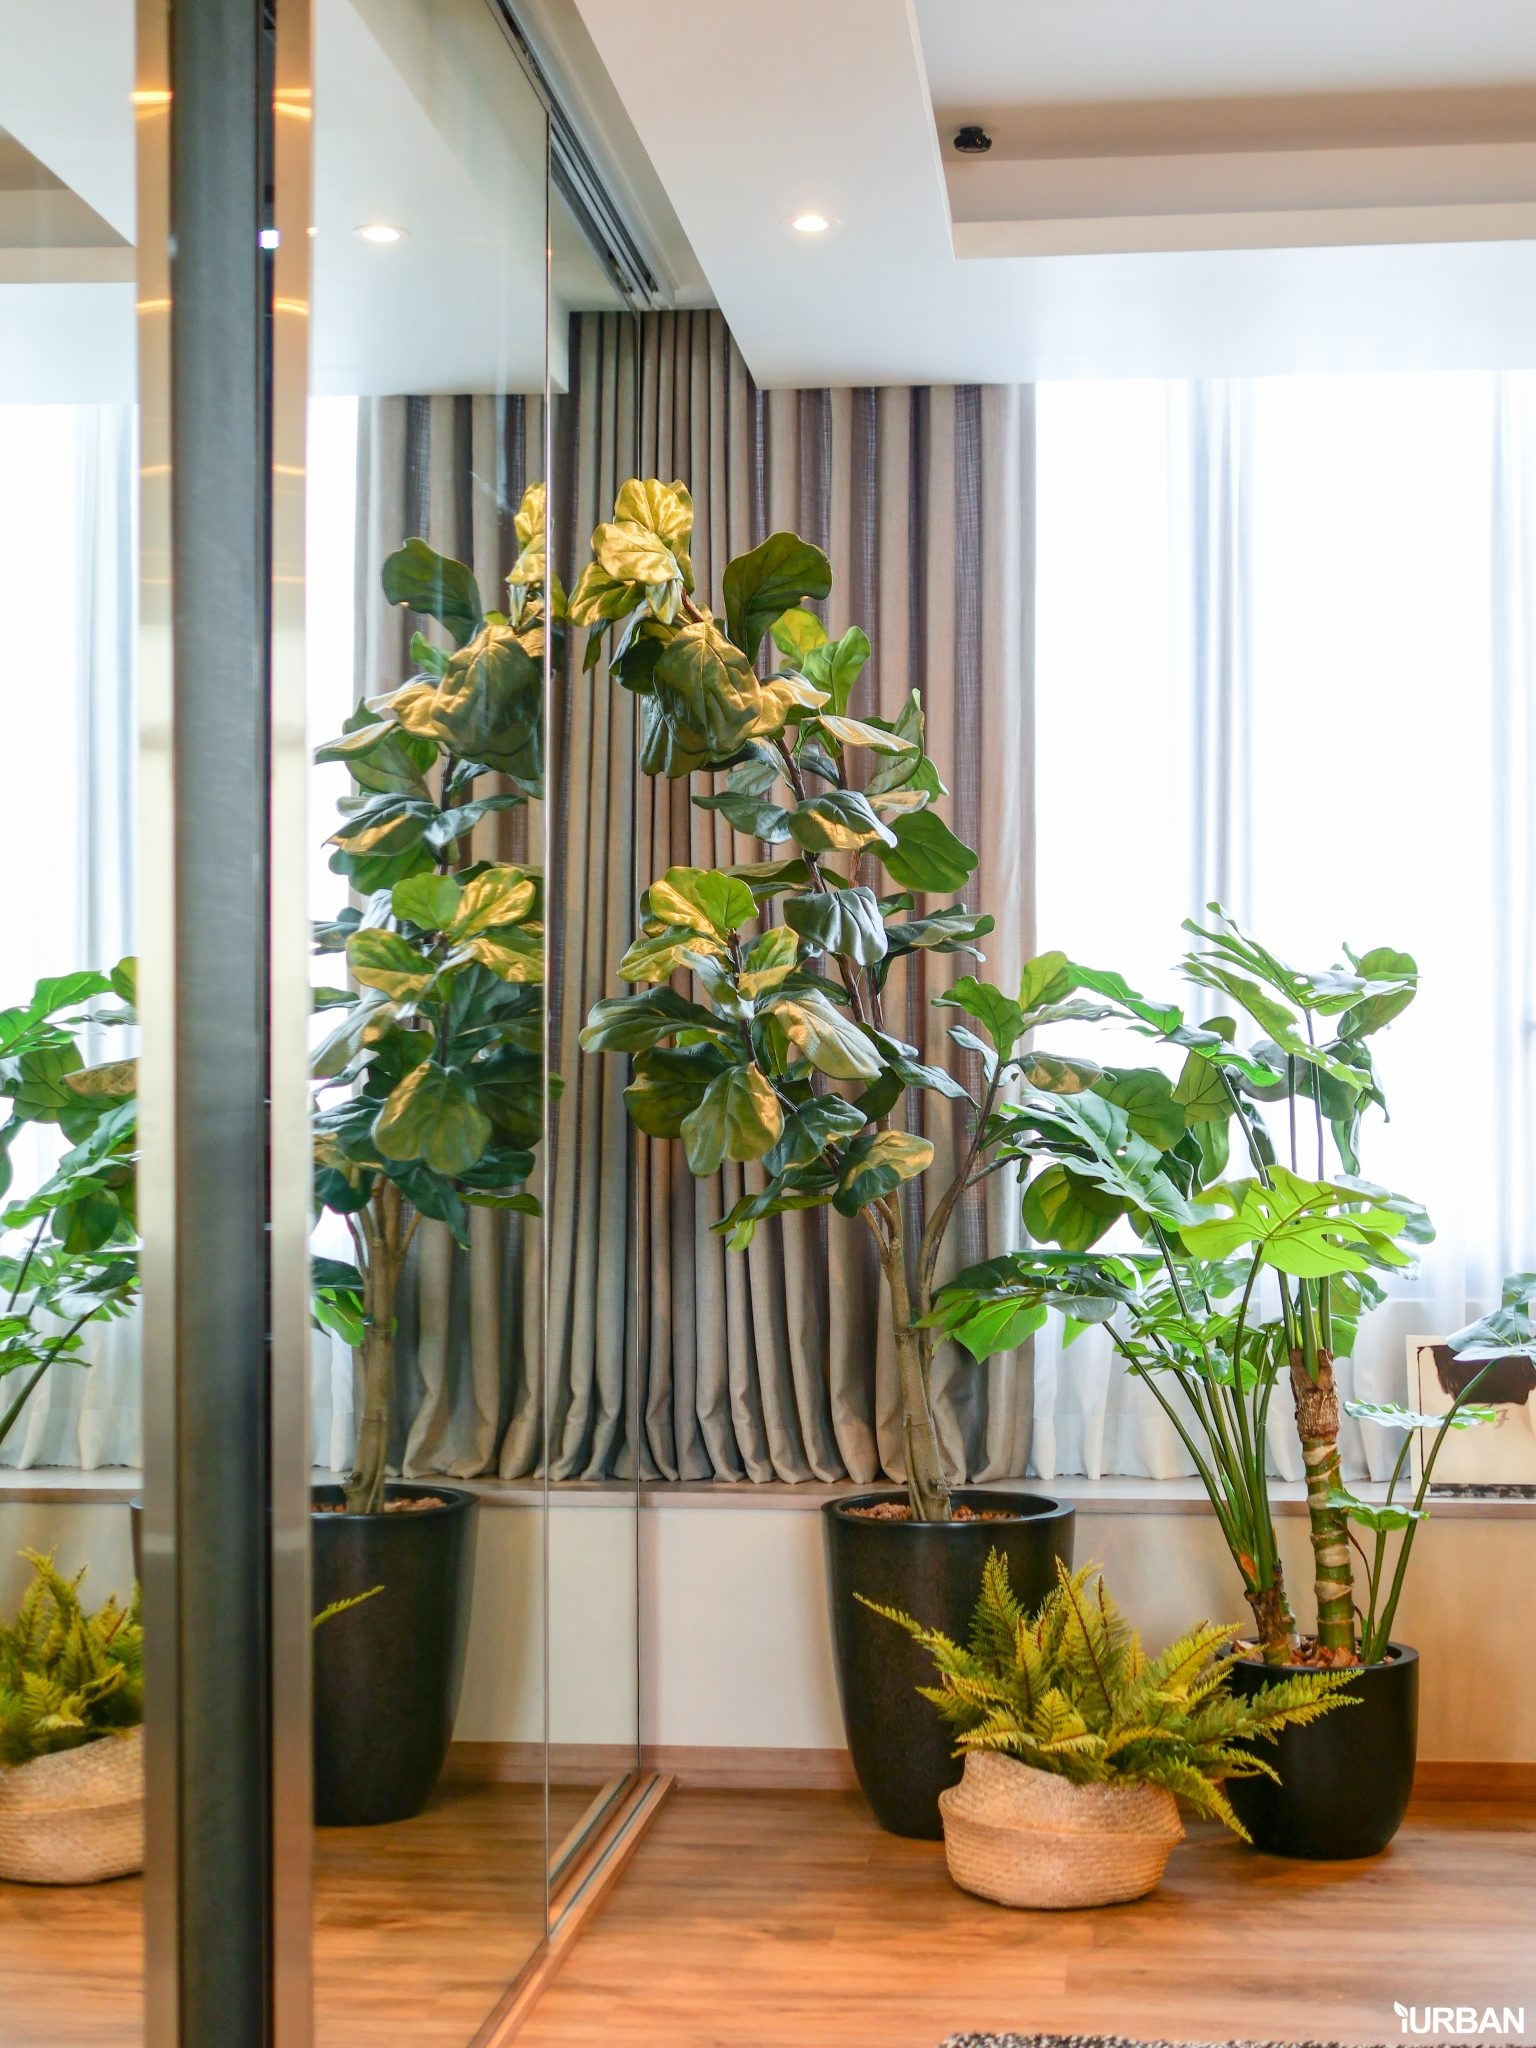 AIRES RAMA9 รีวิว Luxury Townhome 3.5 ชั้น + Rooftop ออกแบบสวย ย่านพระราม9 (ใกล้ รพ.สมิติเวช) 73 - AIRES